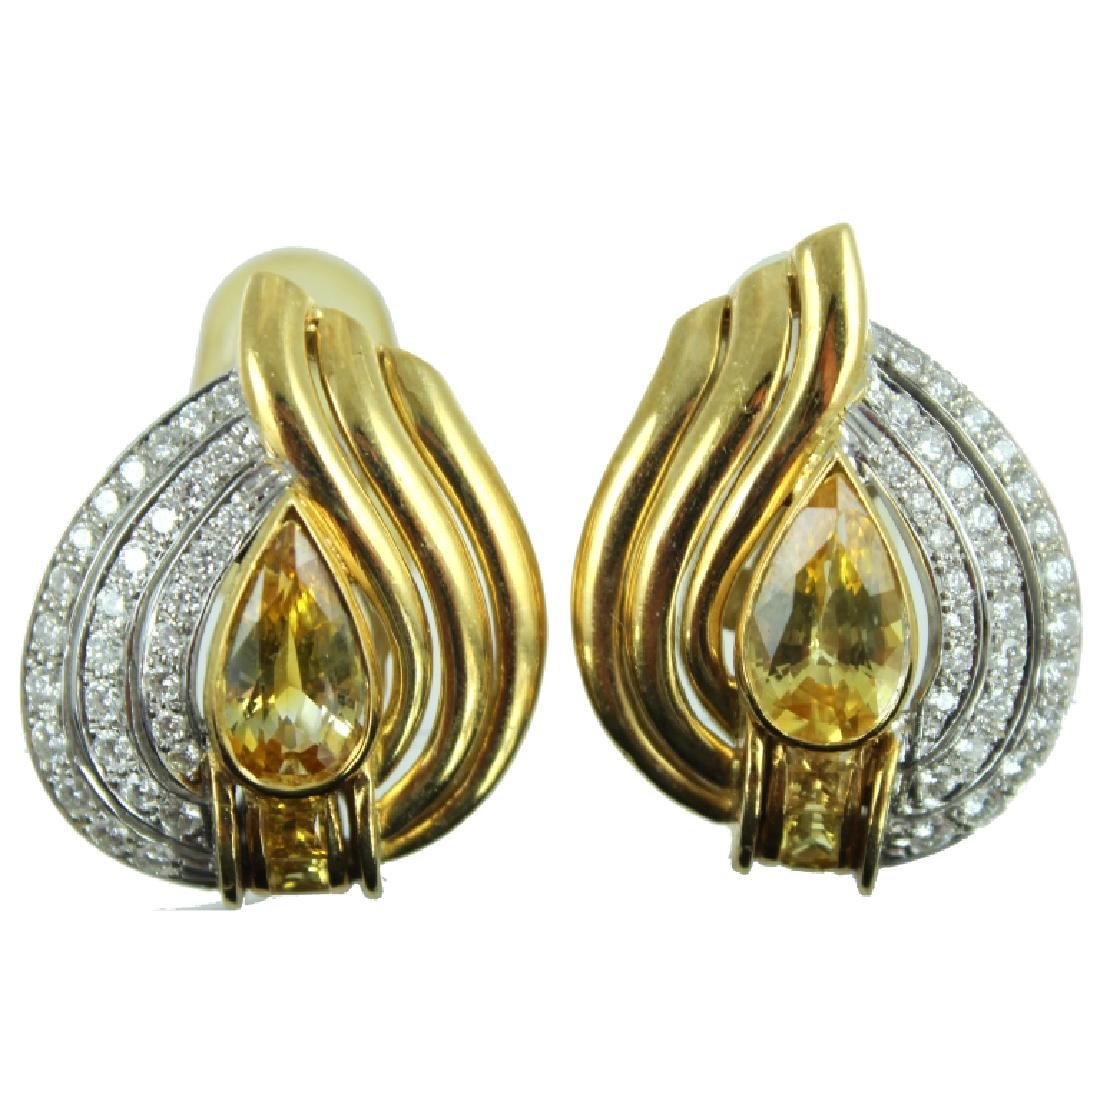 18K TOPAZ & DIAMOND EARRINGS